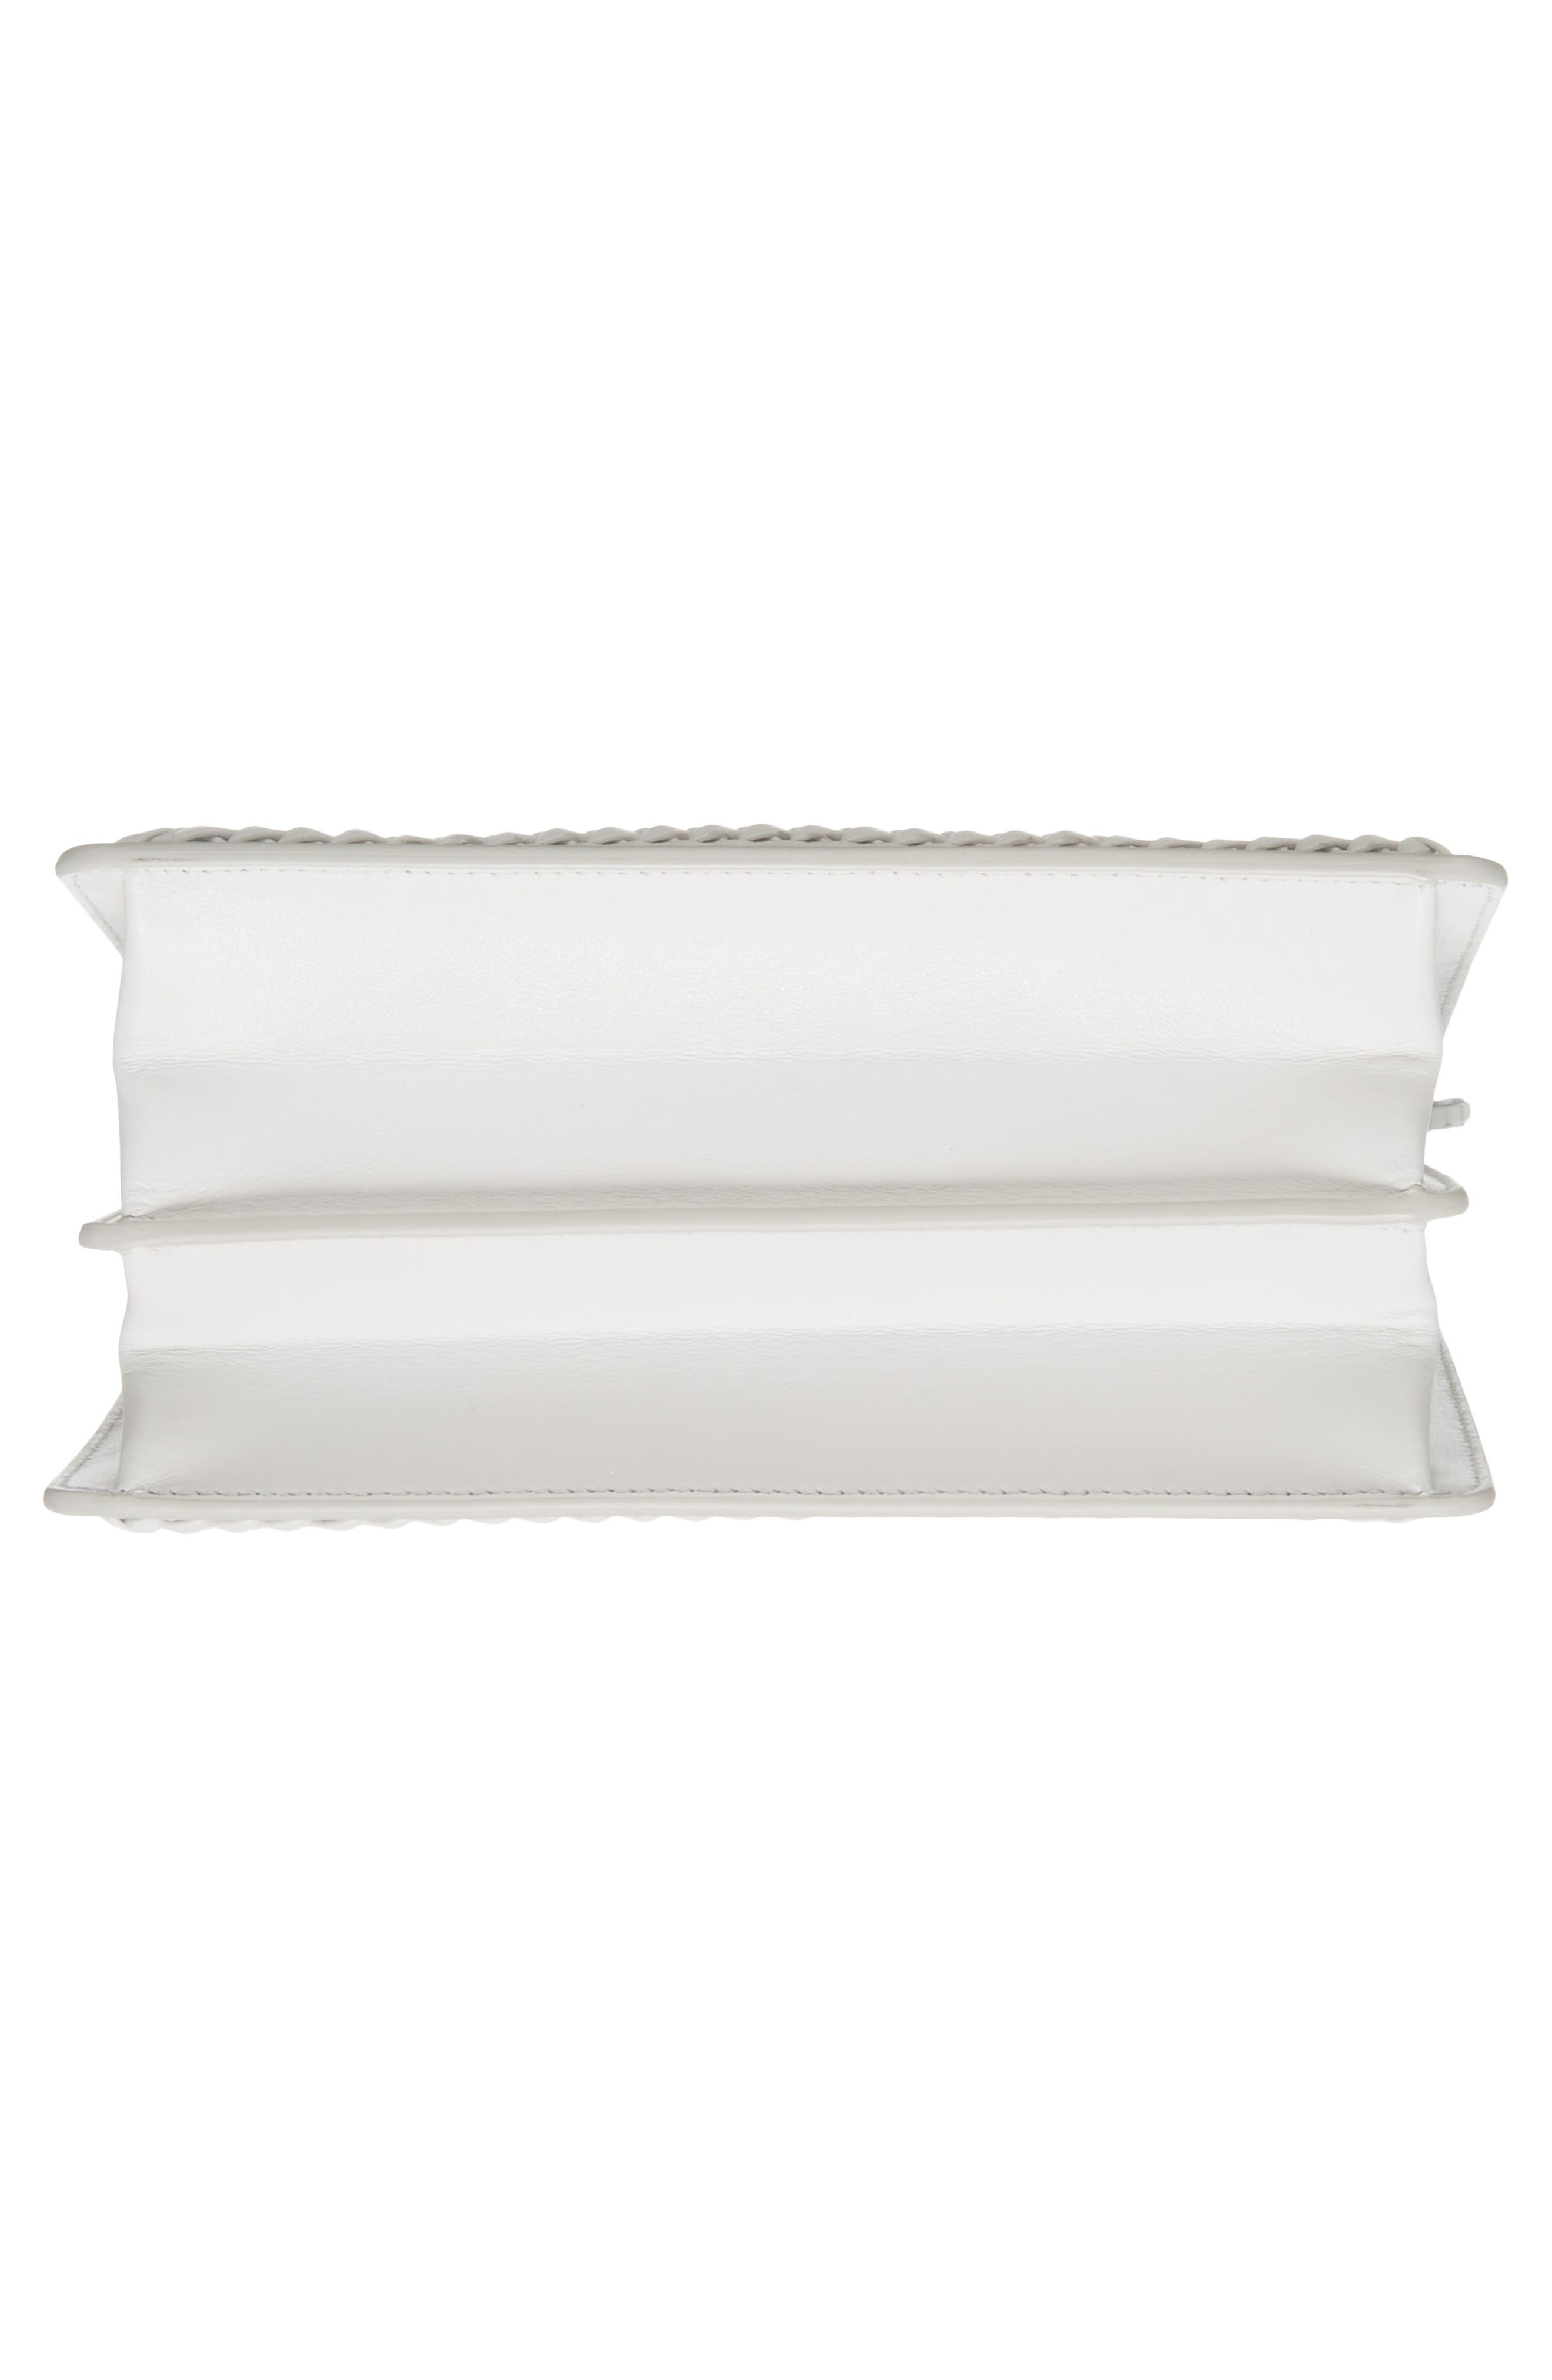 Thalia Gancio Leather Shoulder Bag,                             Alternate thumbnail 6, color,                             New Bianco Ottico